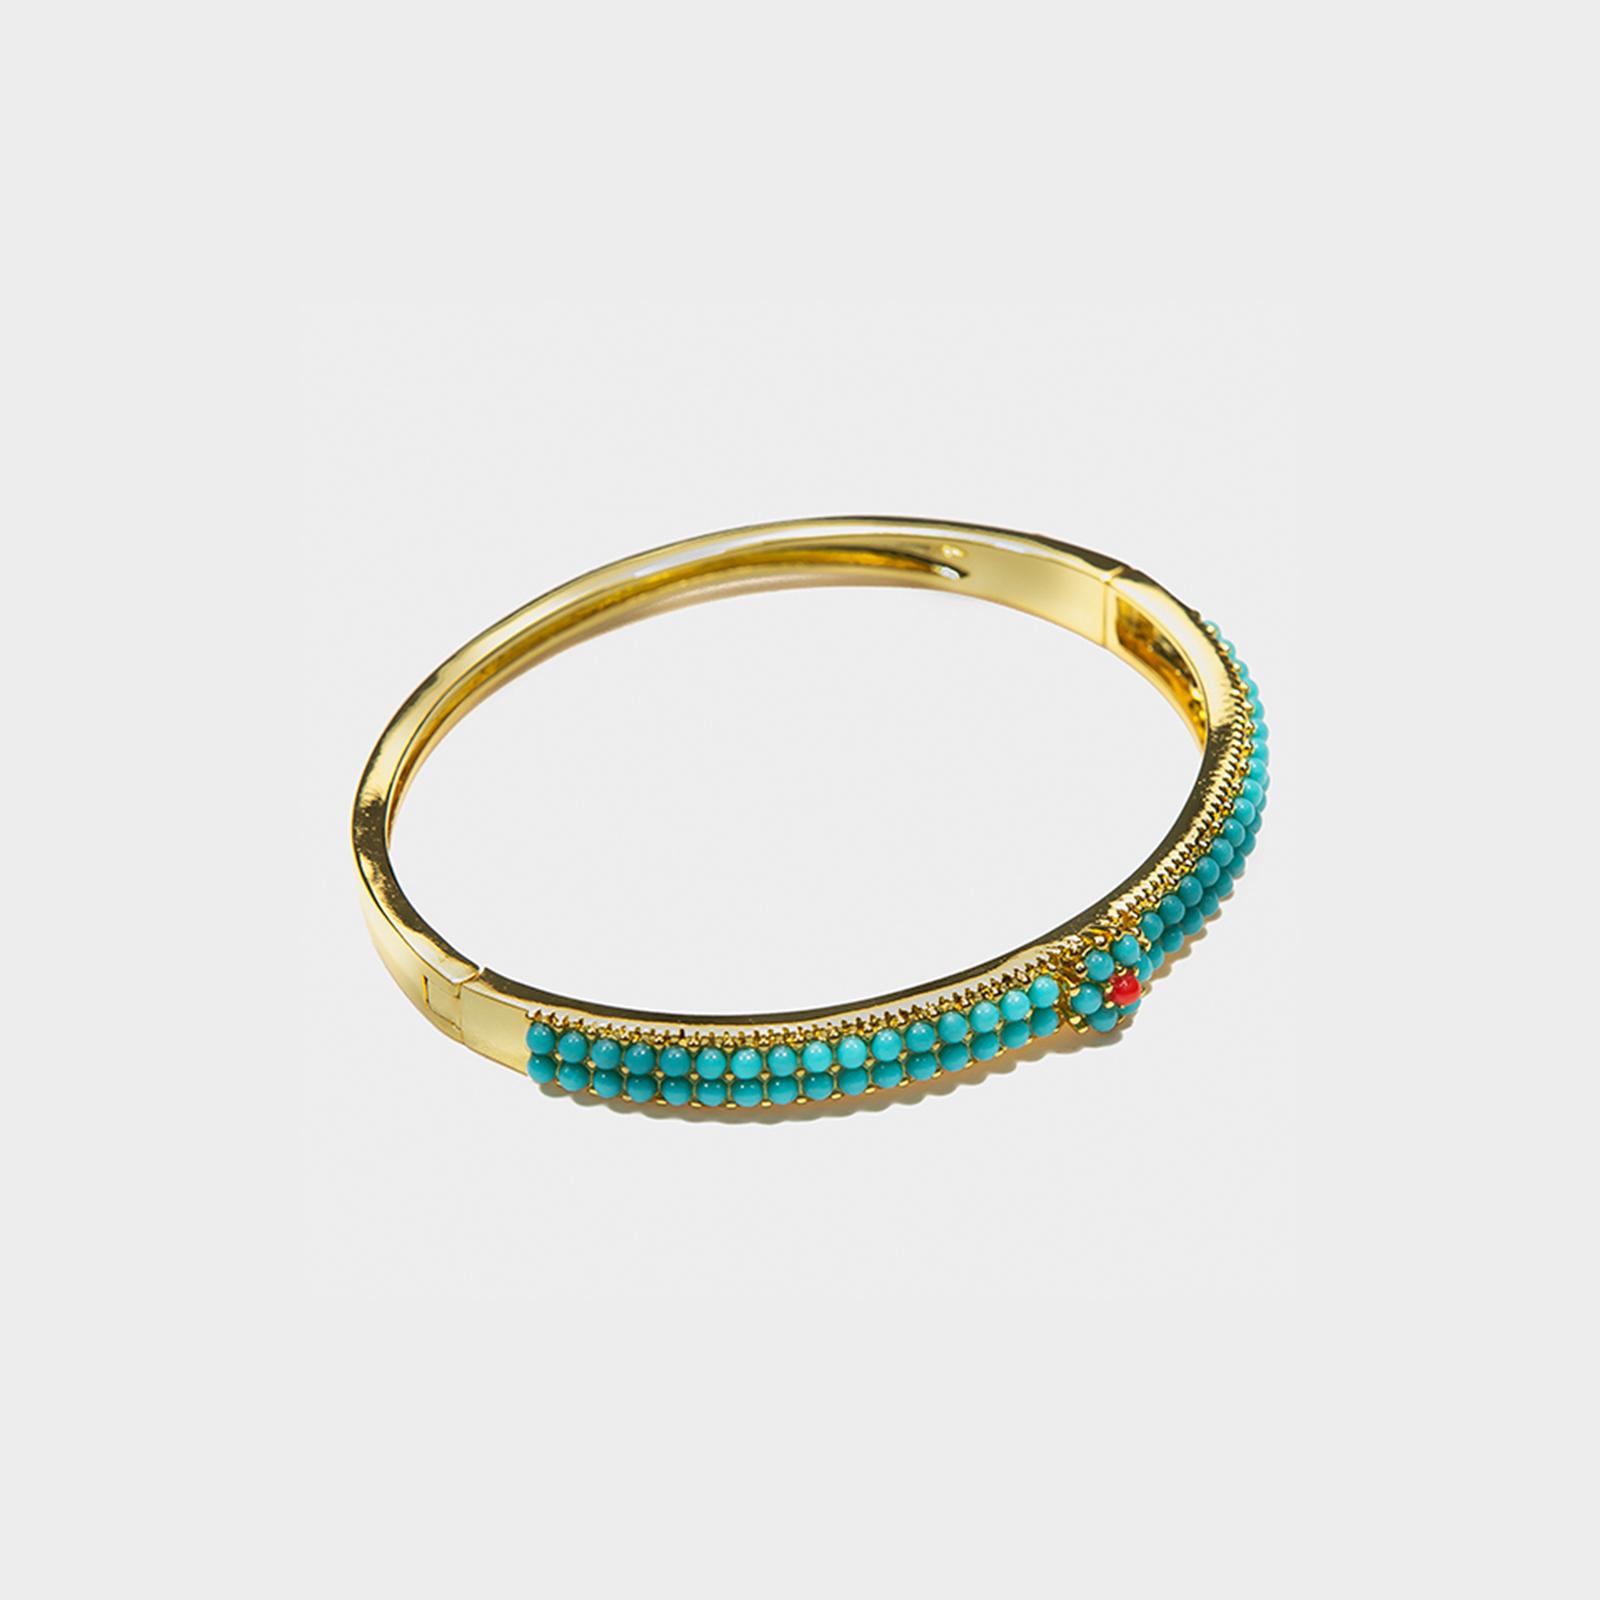 The Amazon Bracelet Turquoise